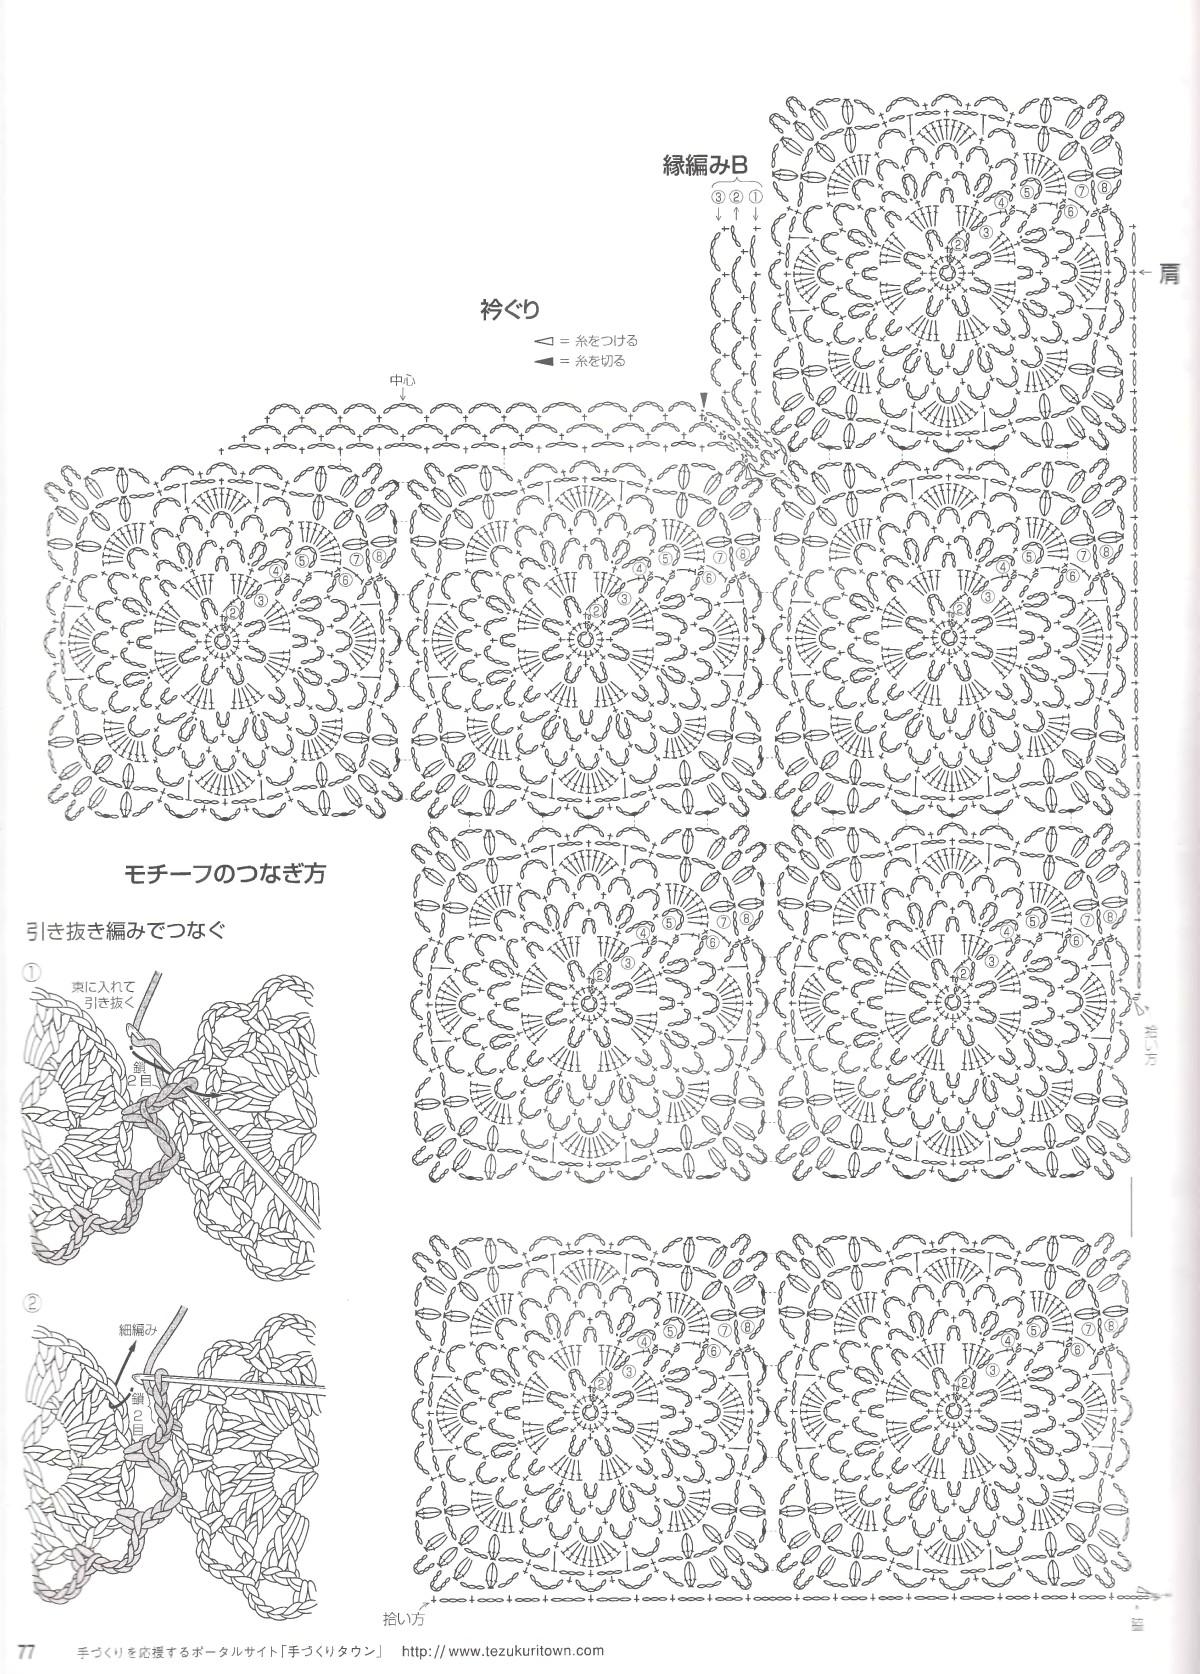 Lets-knit-series-NV4359-2008-Spring-Summer-sp-kr_75.jpg